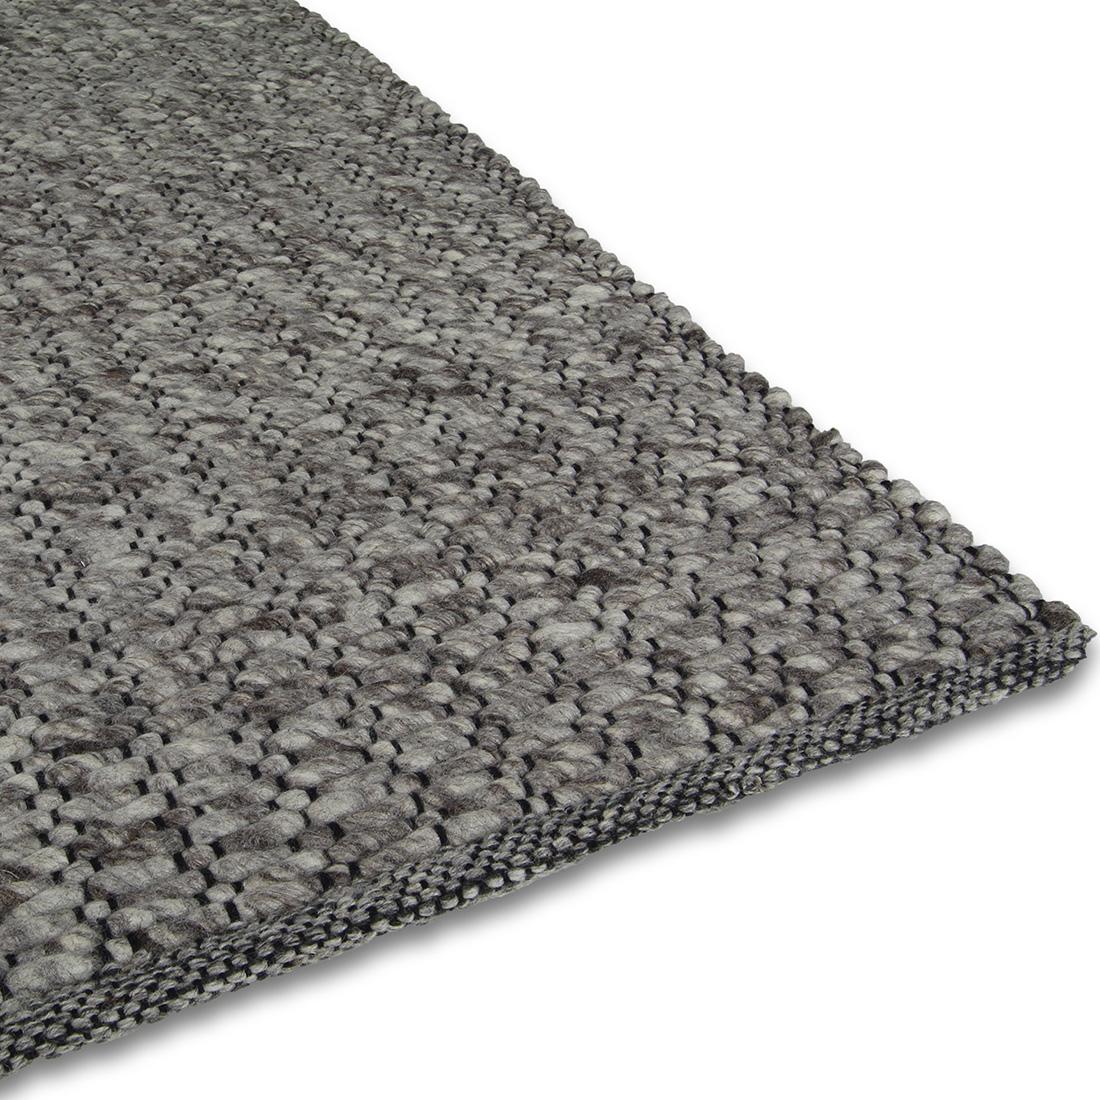 Vloerkleed Brinker Skana Grey | 240 x 340 cm